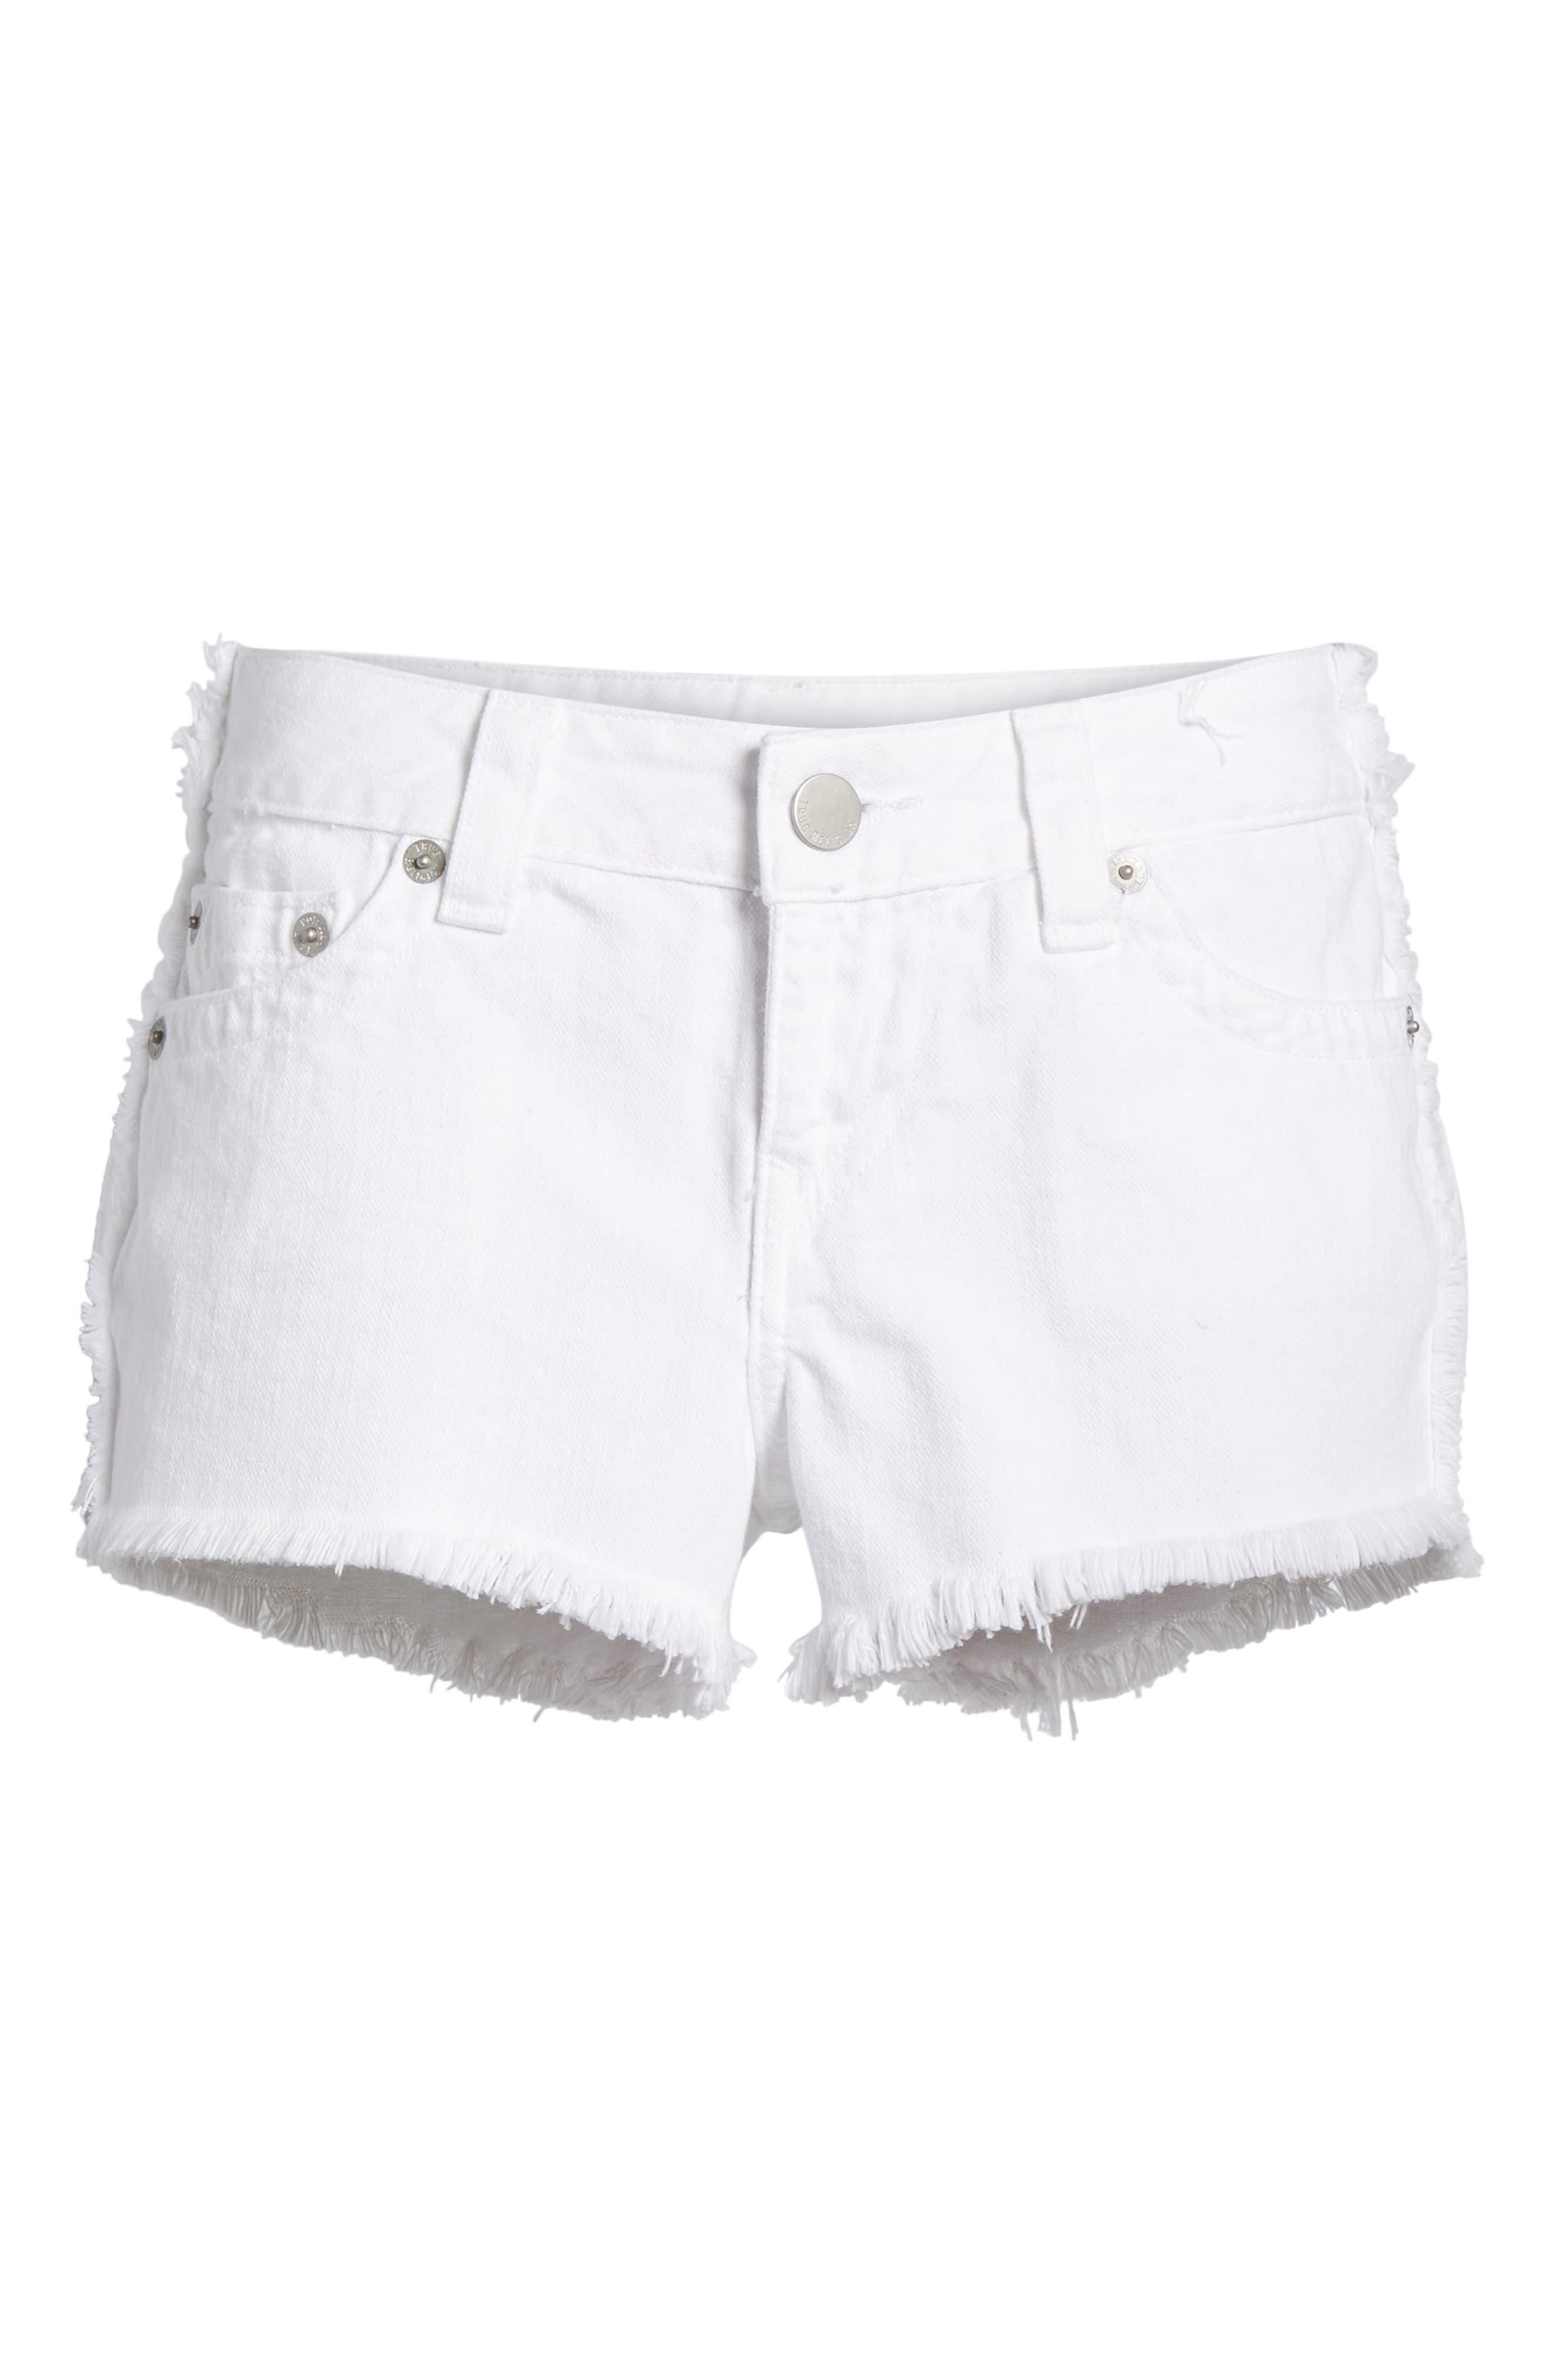 Kieras Cutoff Denim Shorts,                             Alternate thumbnail 7, color,                             100